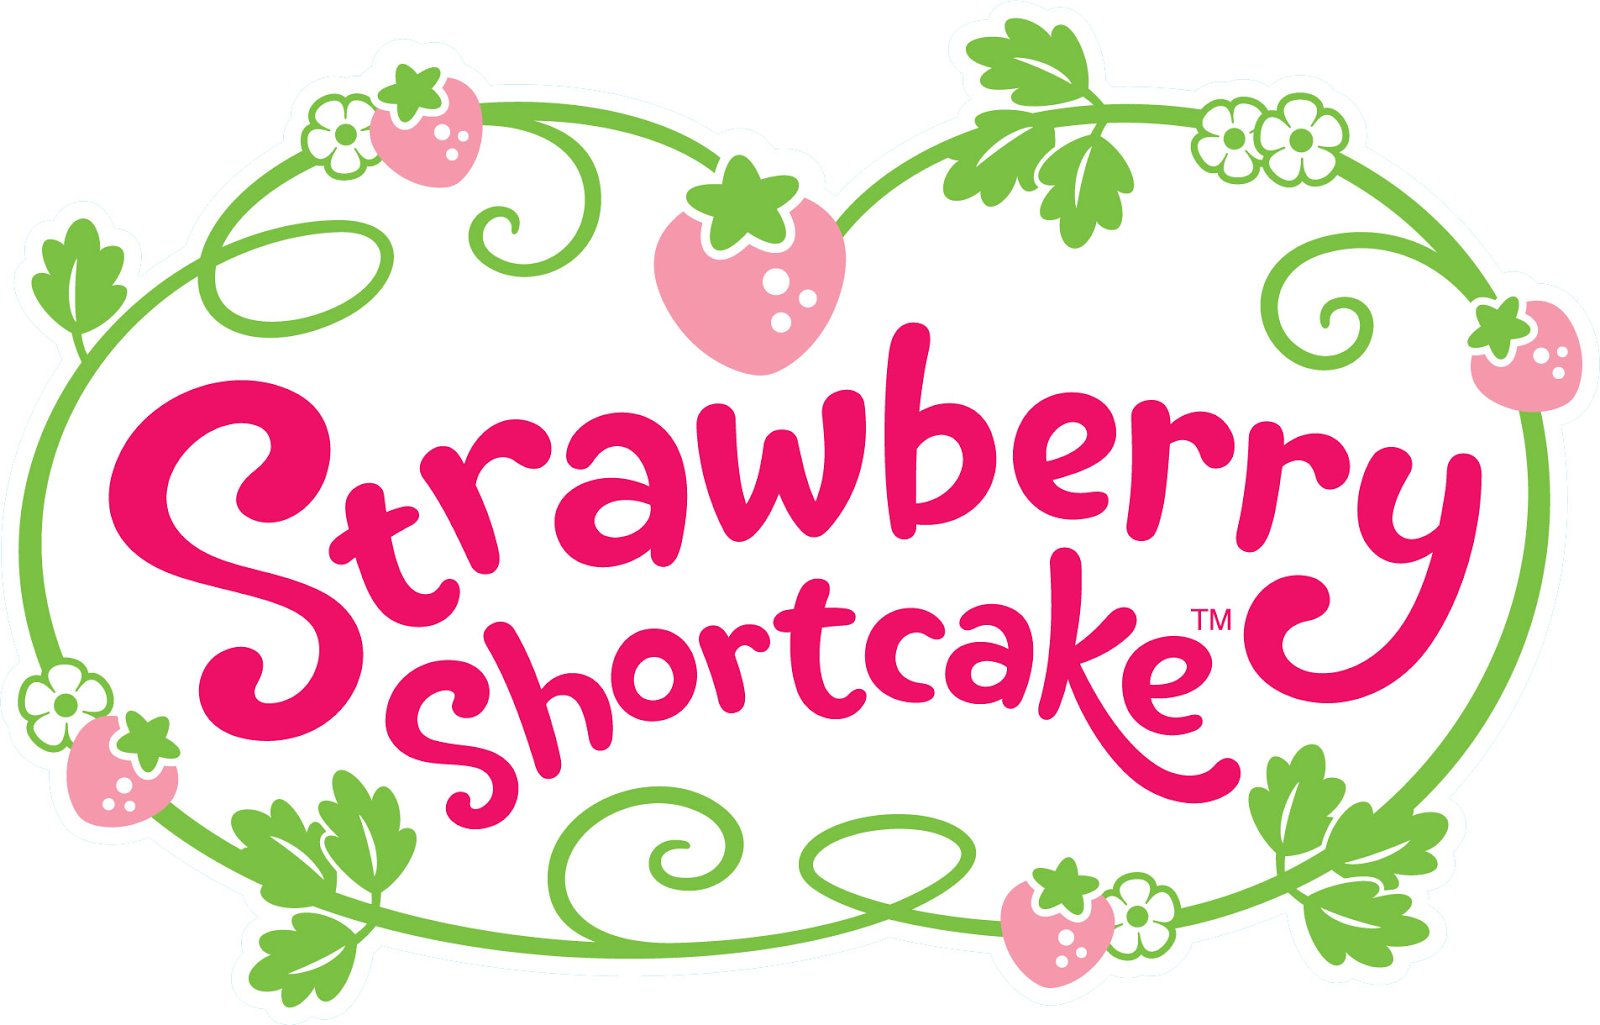 original strawberry shortcake wallpaper